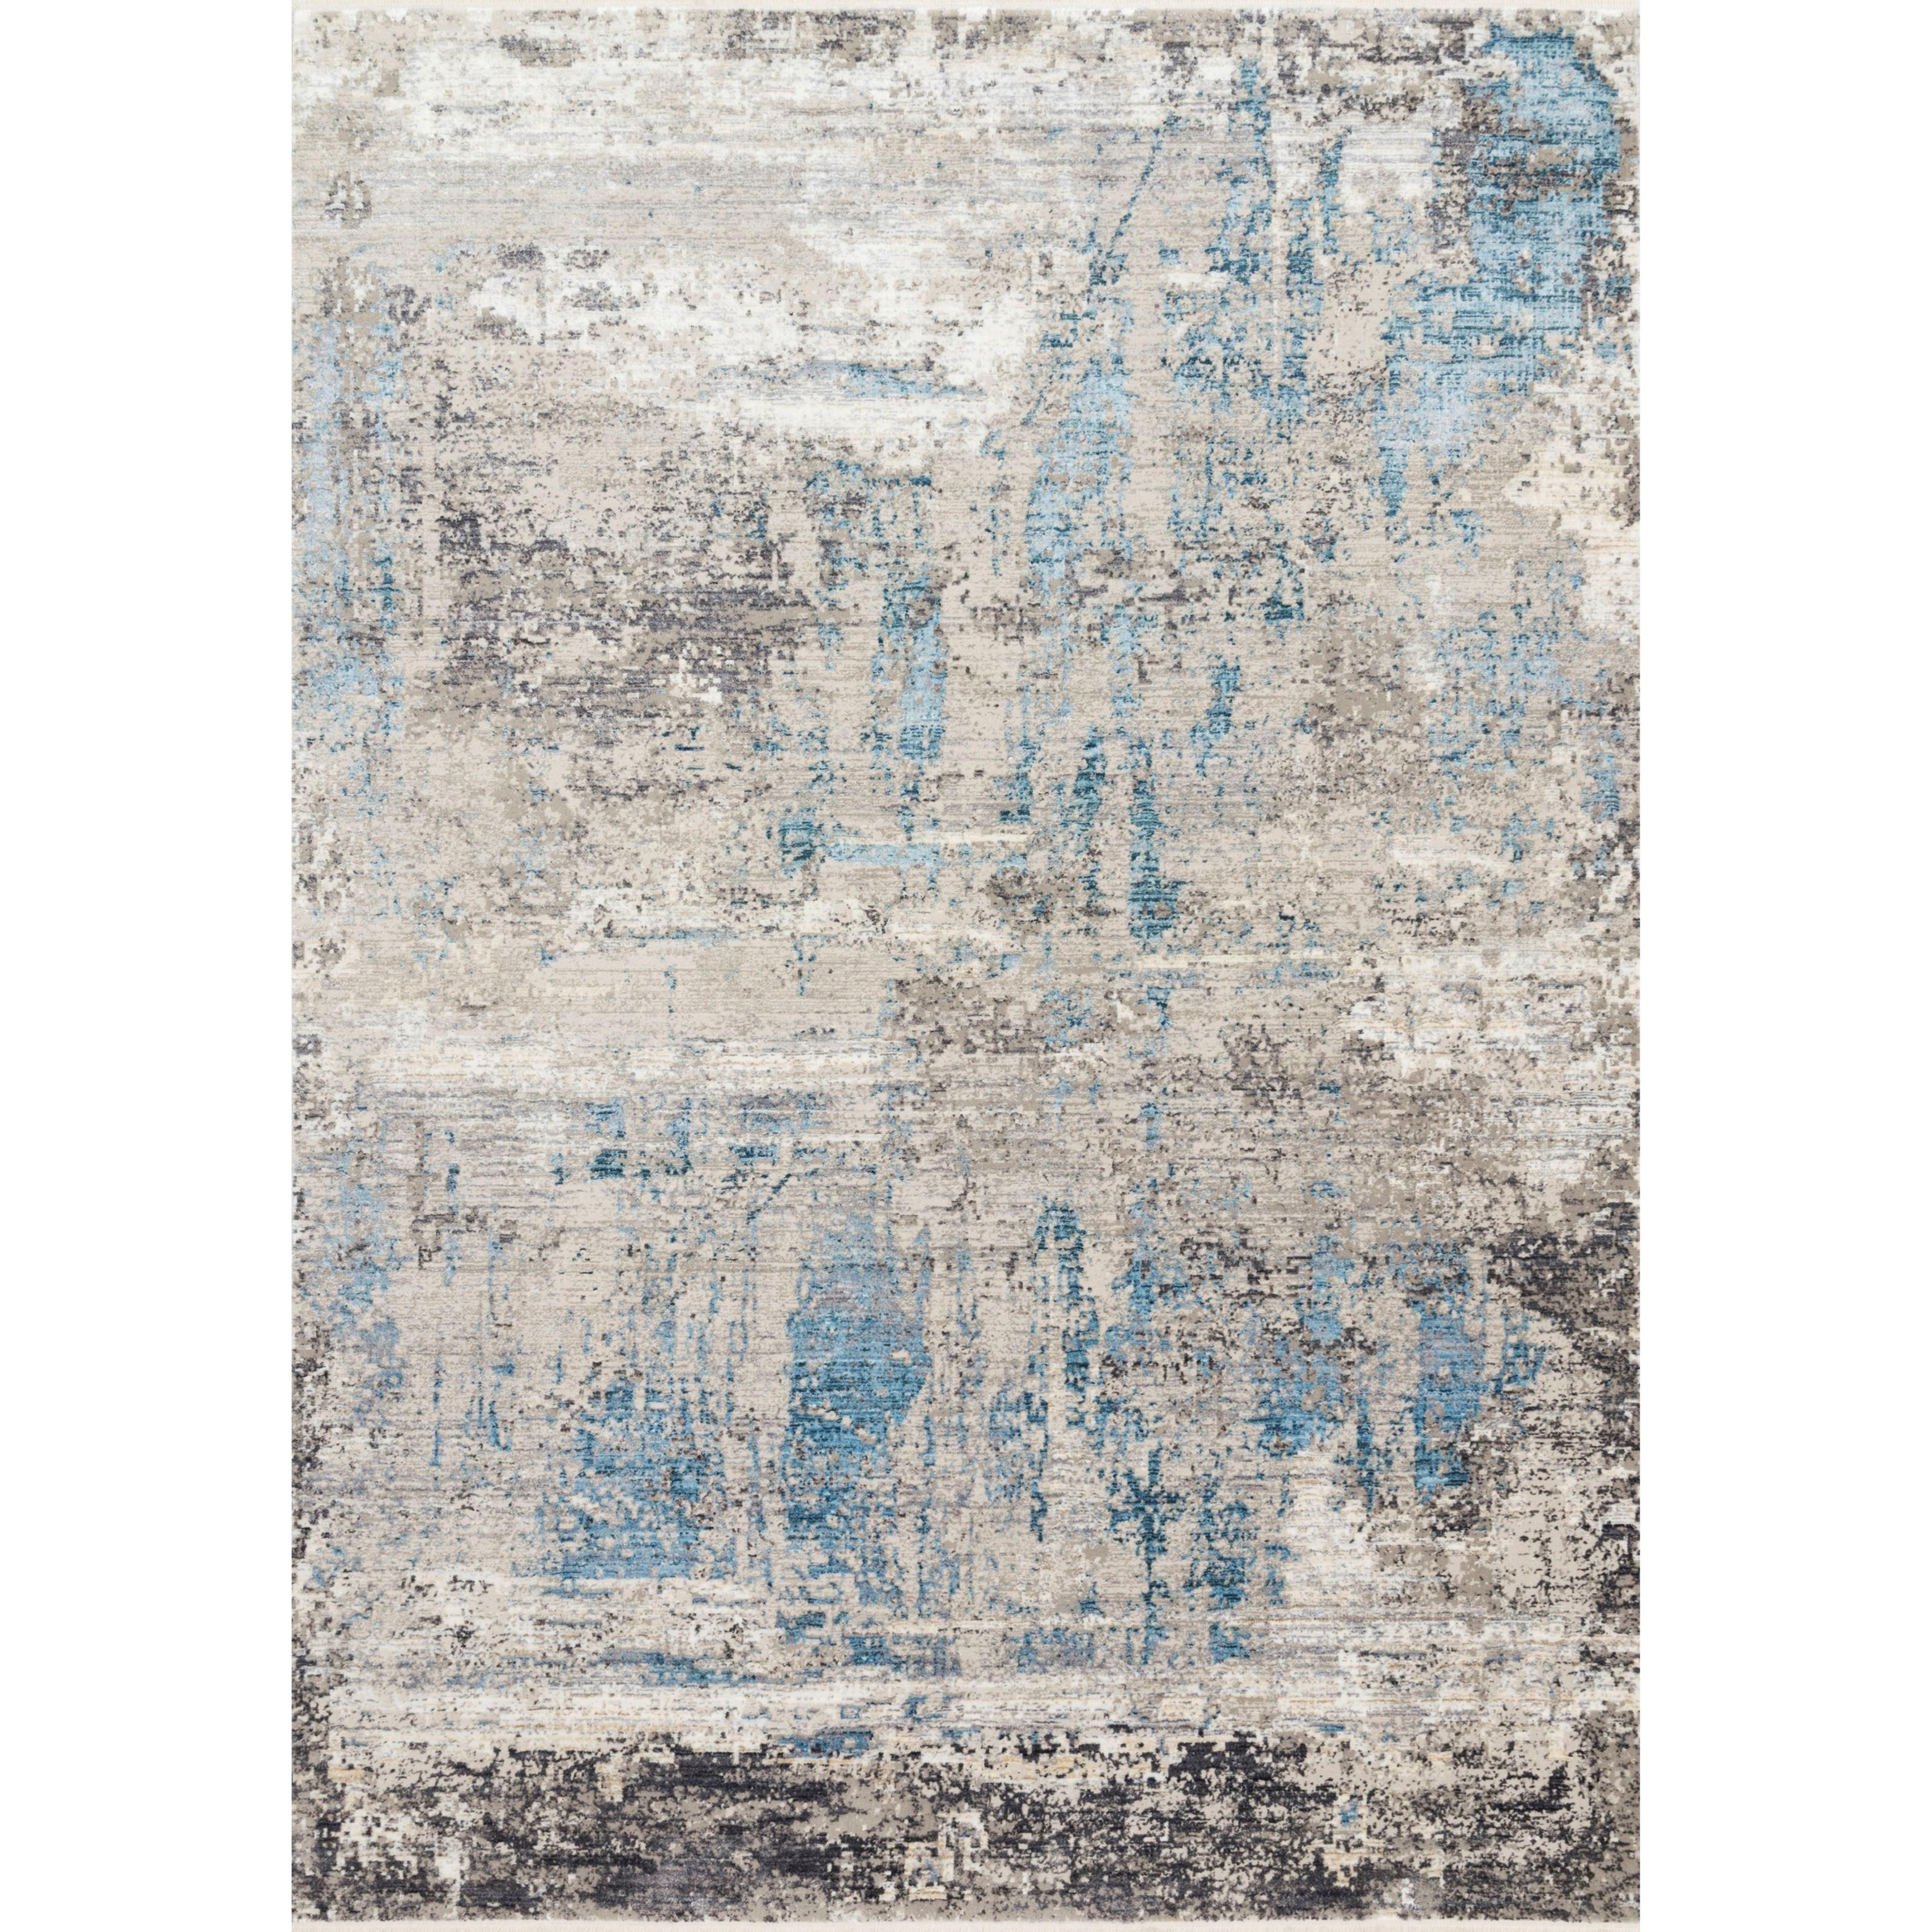 "Franca 7'10"" x 10'2"" Grey / Ocean Rug by Loloi Rugs at Virginia Furniture Market"